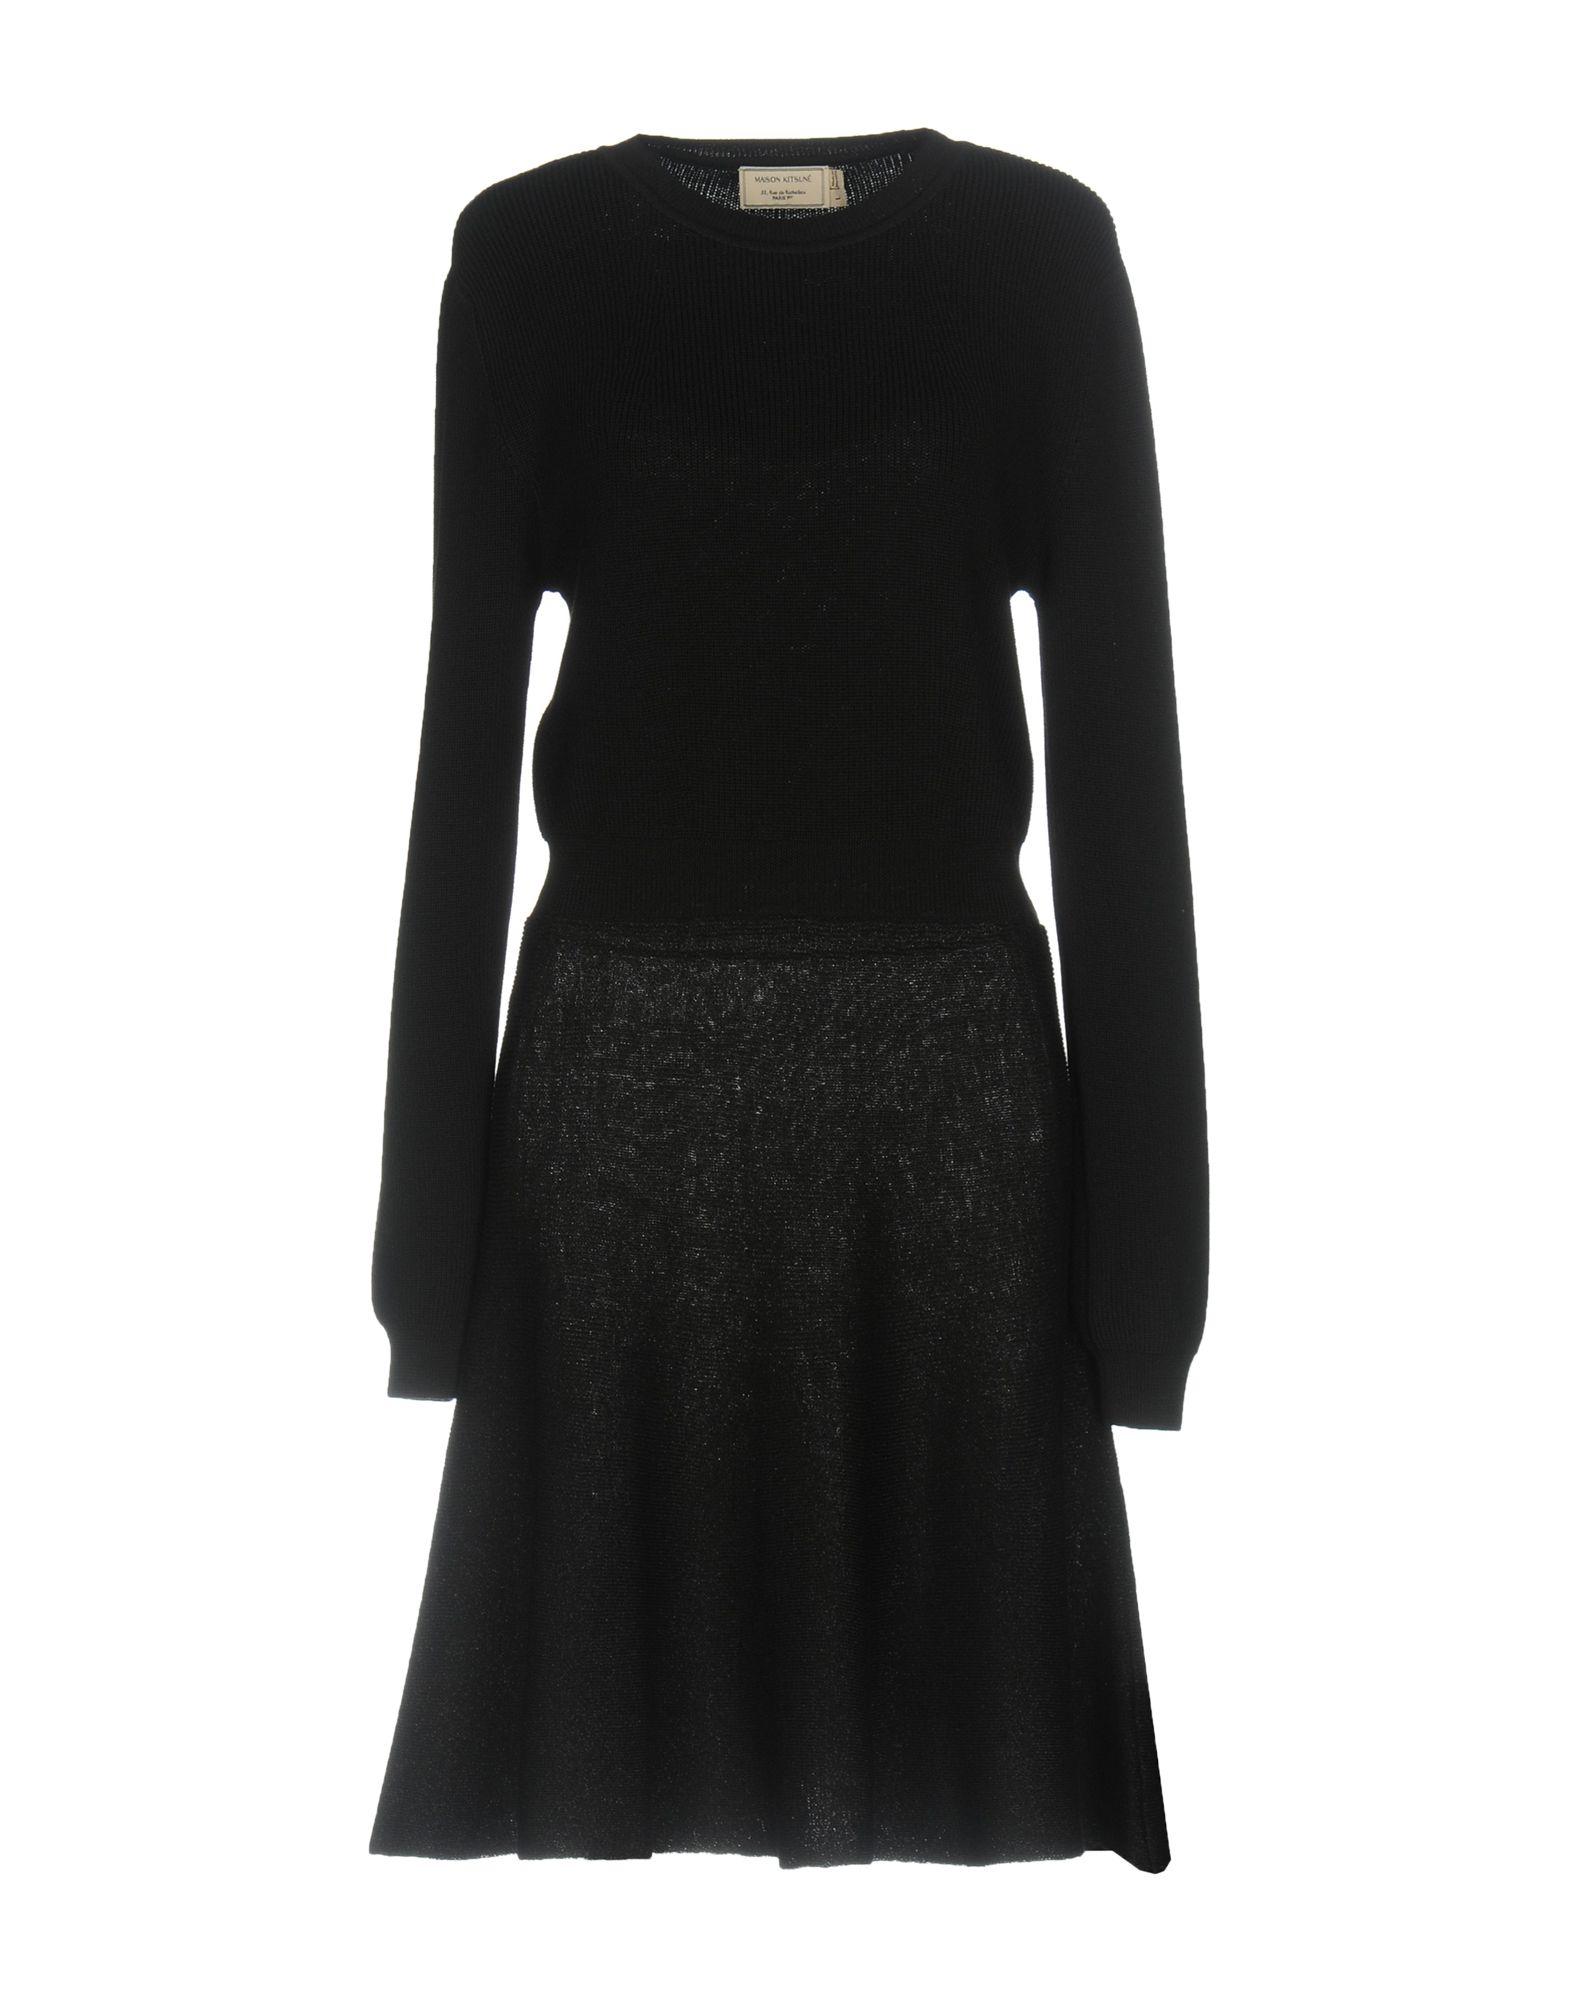 MAISON KITSUNÉ Damen Kurzes Kleid Farbe Schwarz Größe 5 - broschei